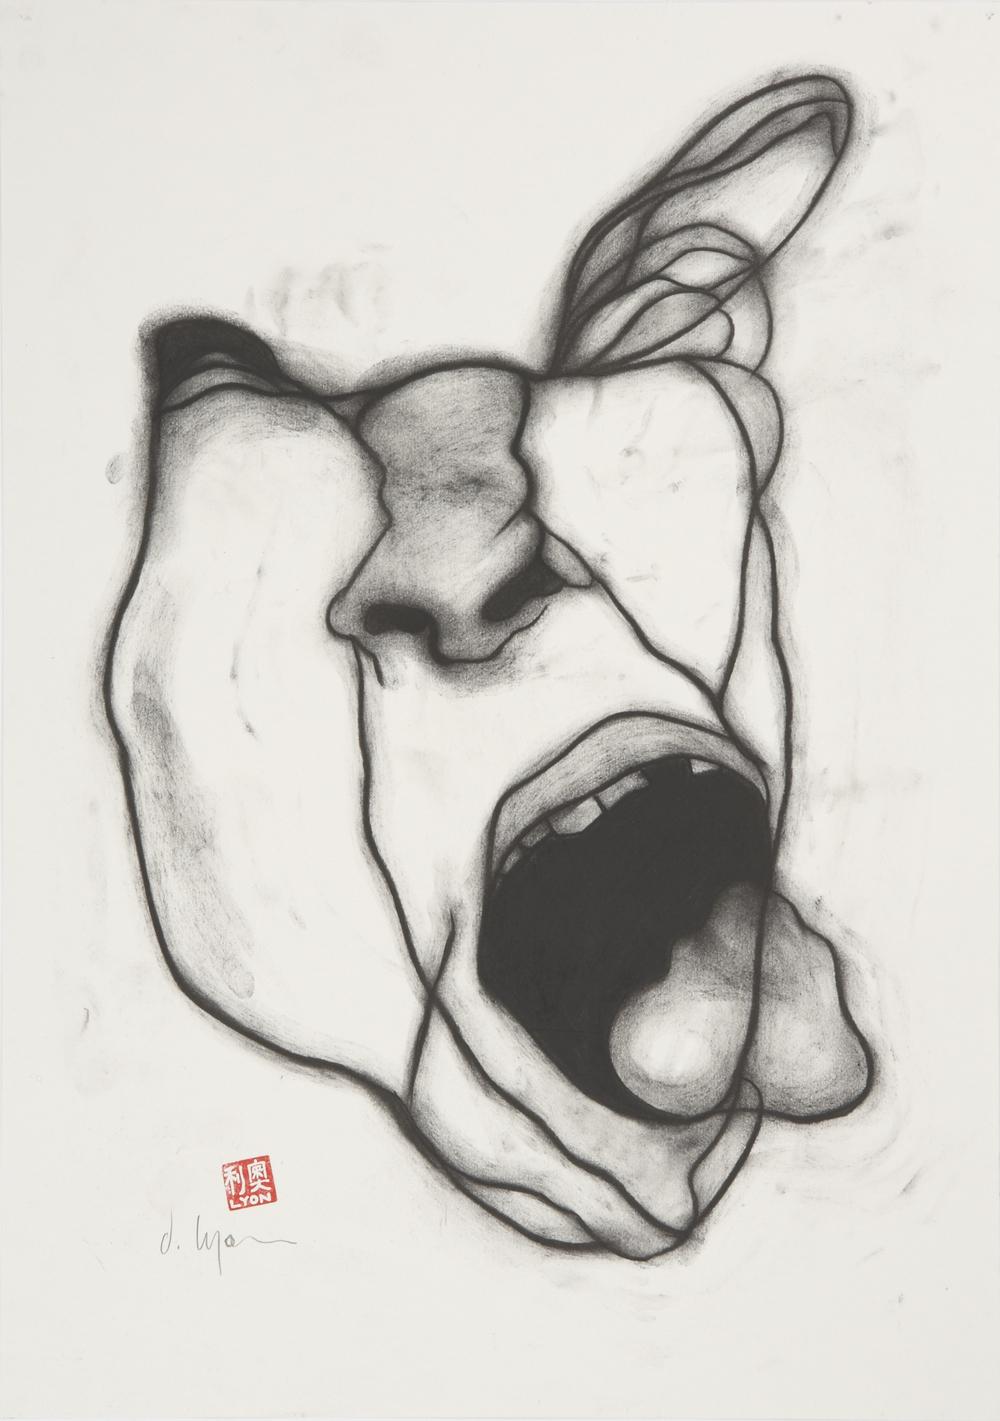 Portrait Mask Caricature 7 - 022 - 150dpi.jpg